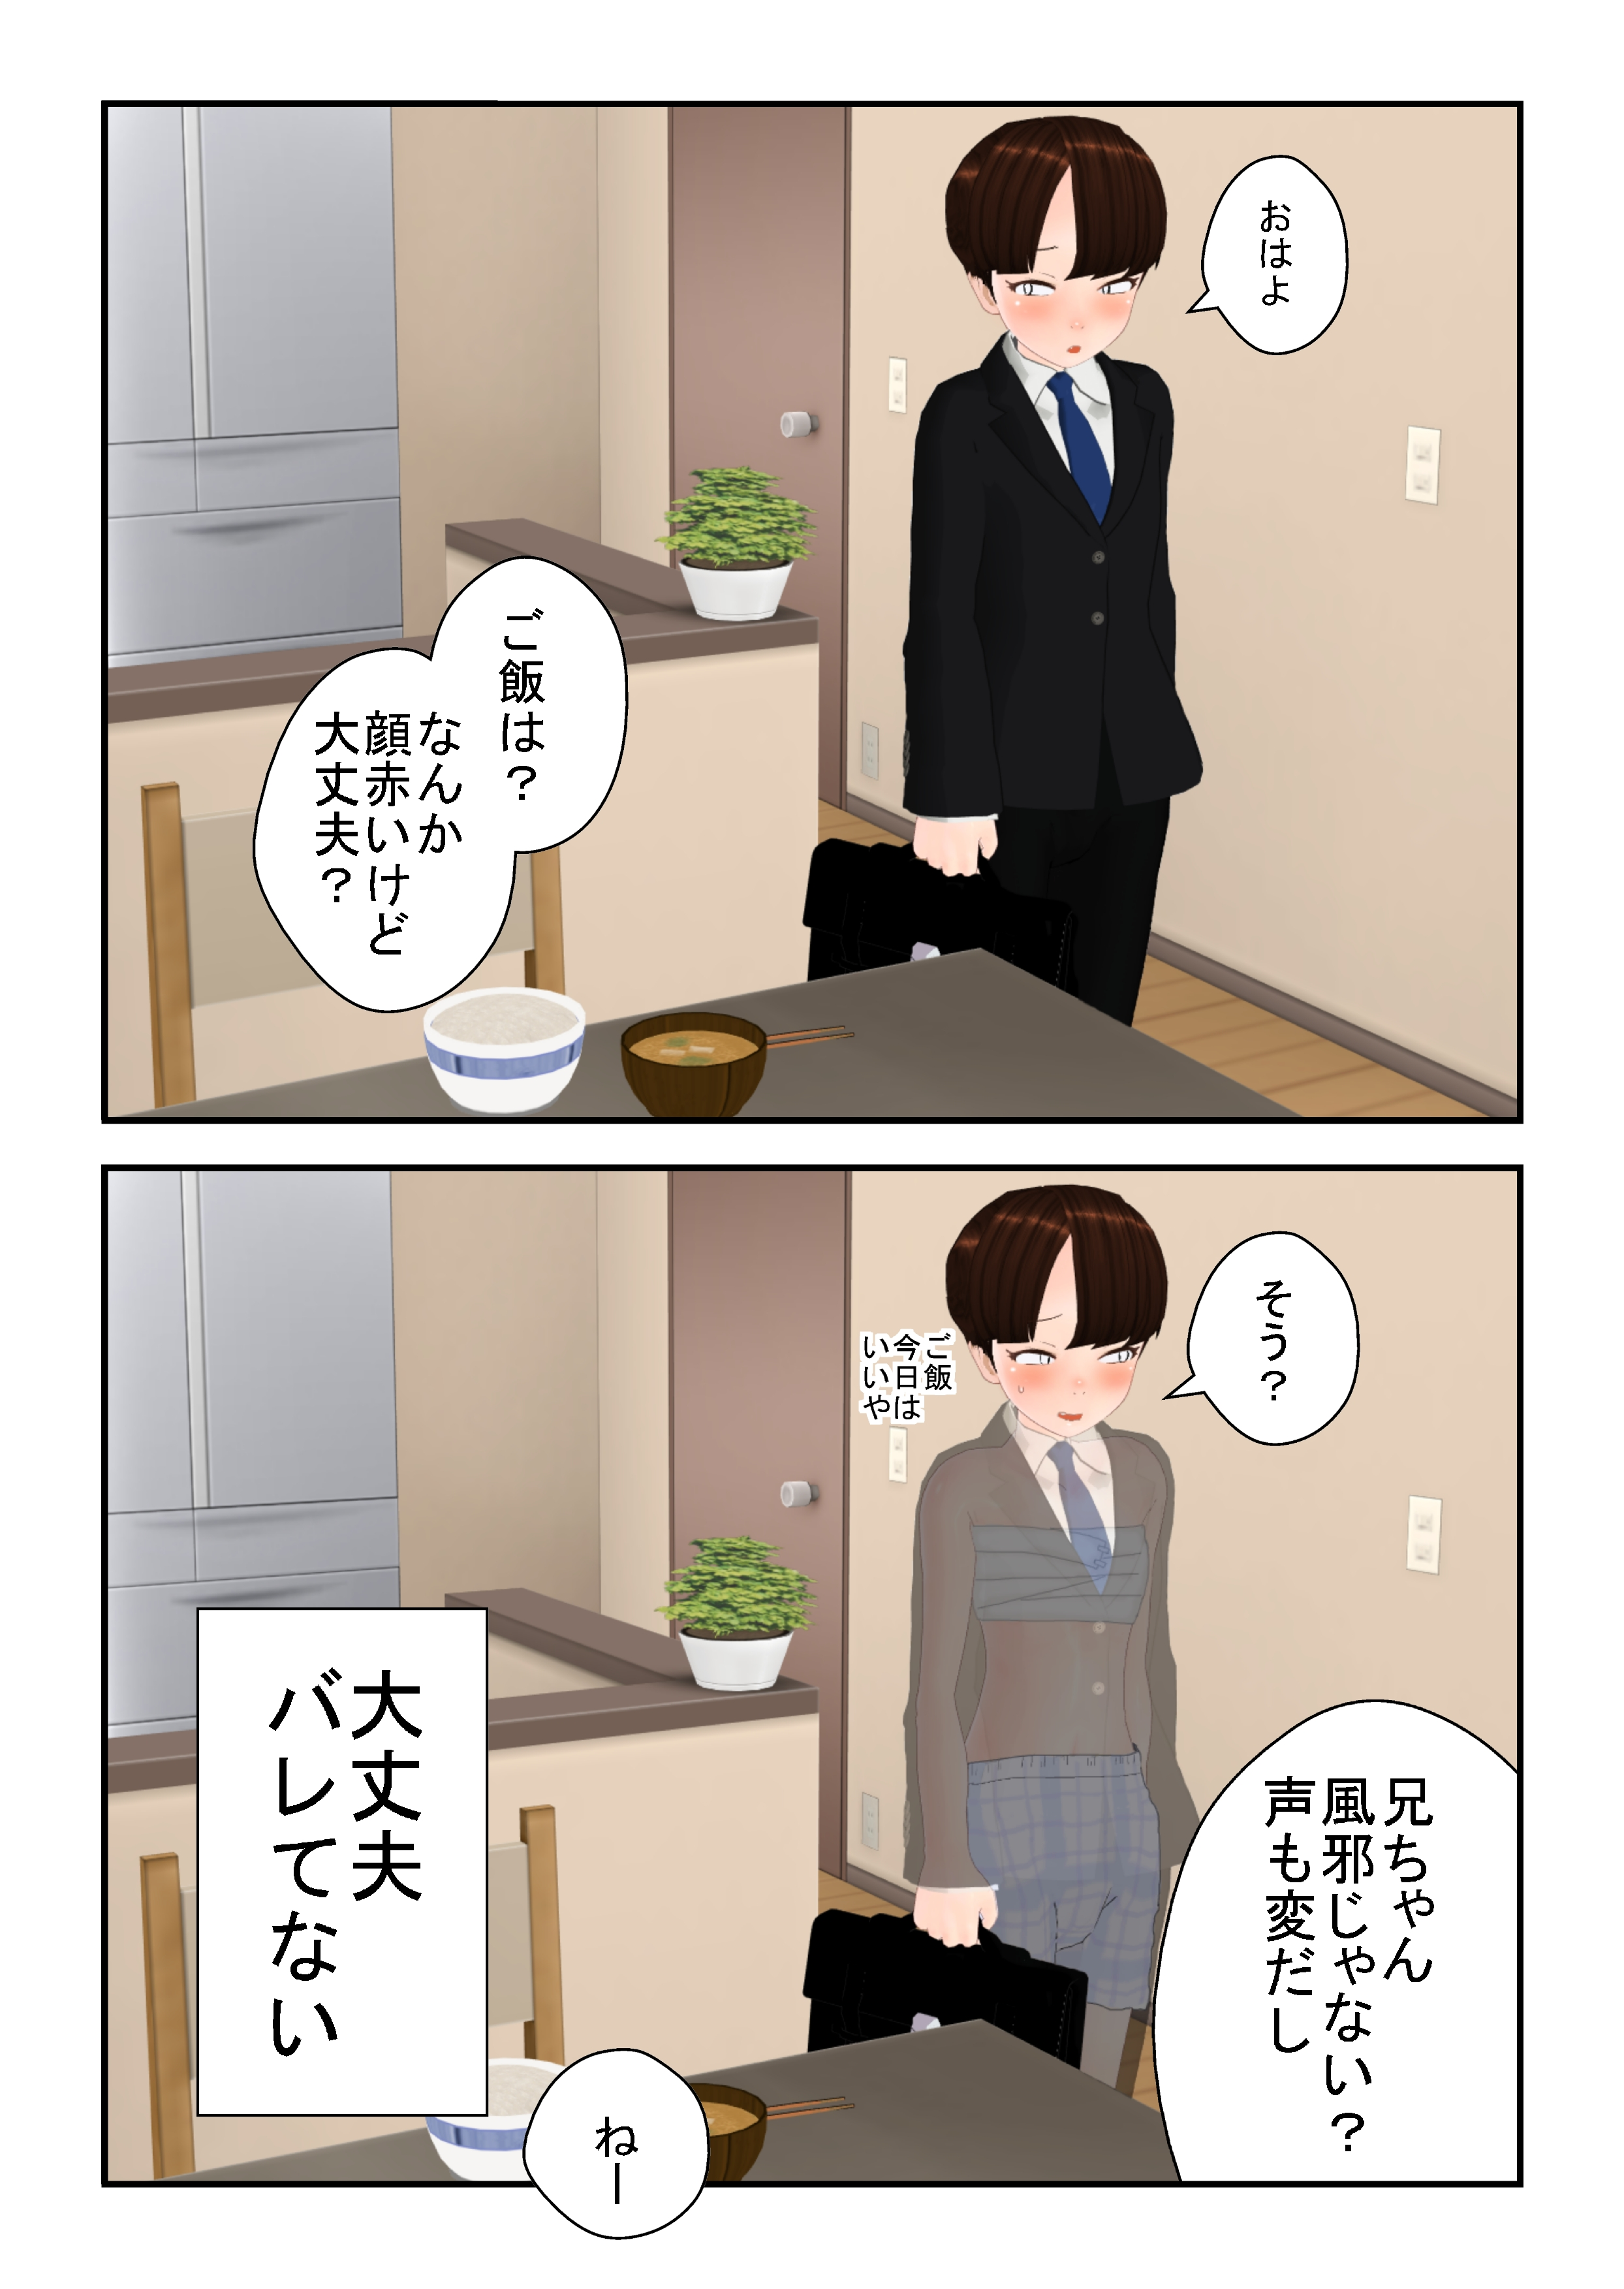 himitsu_0001_2.jpg